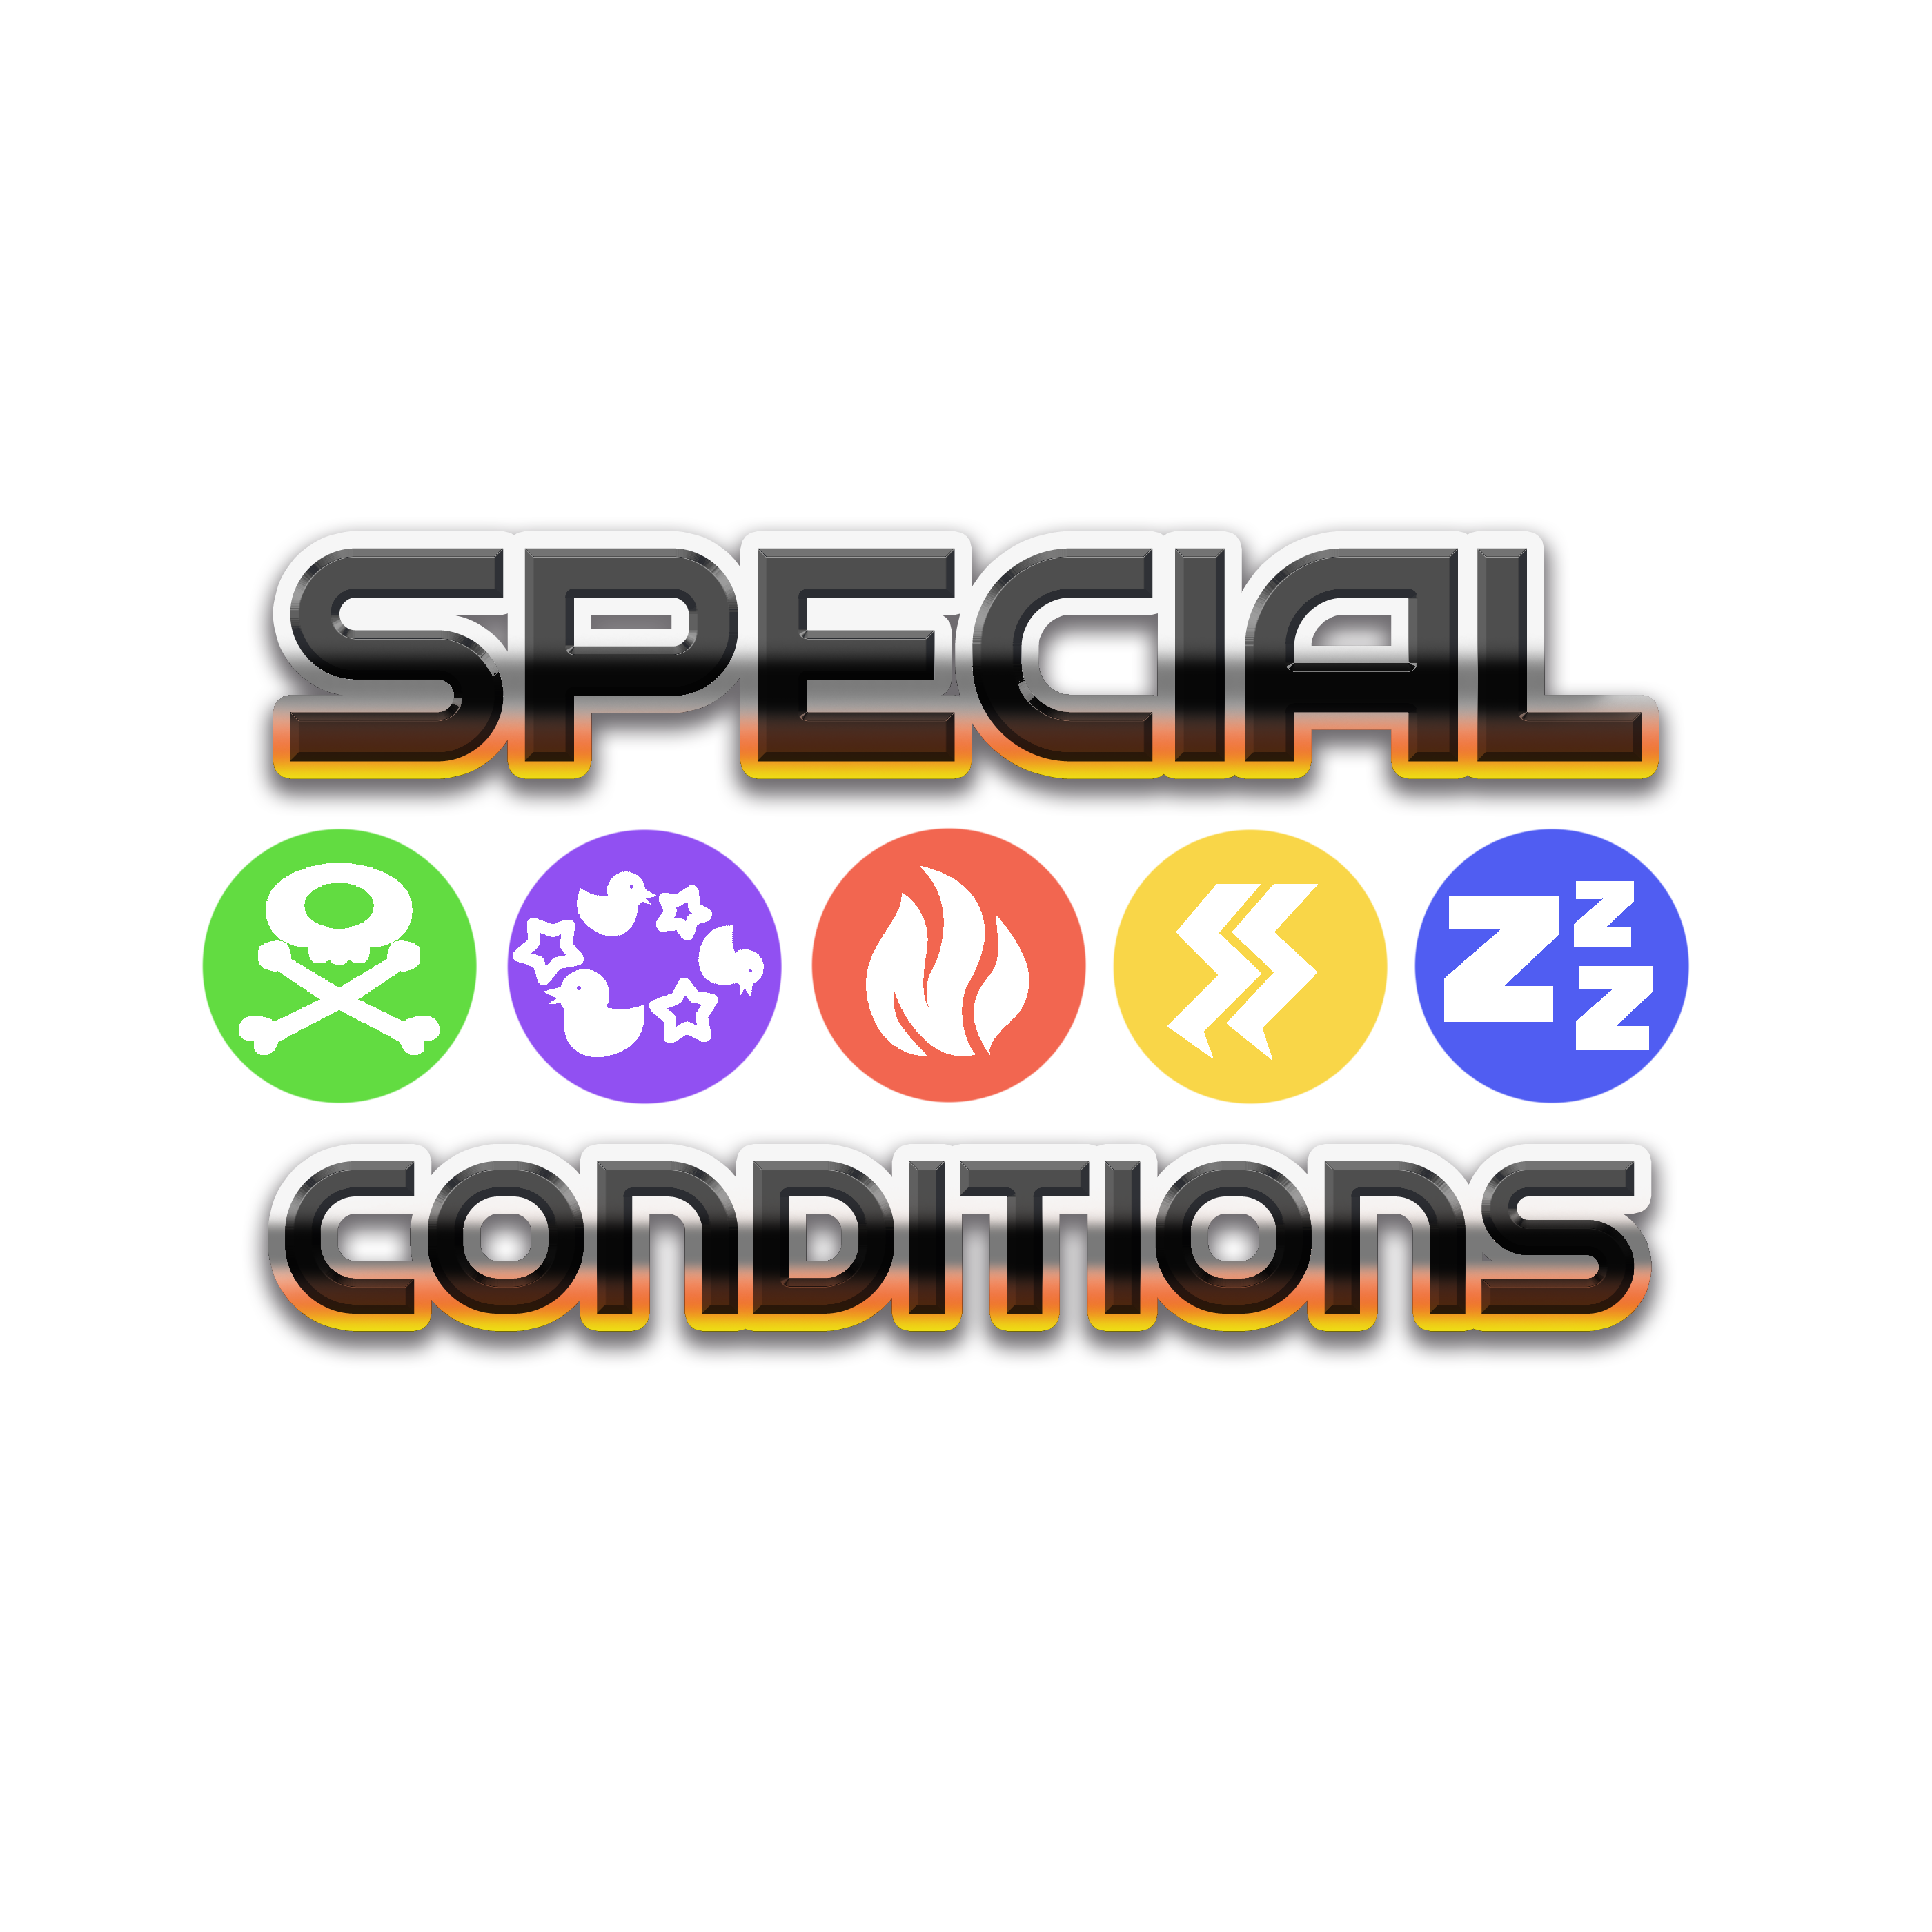 Special Conditions